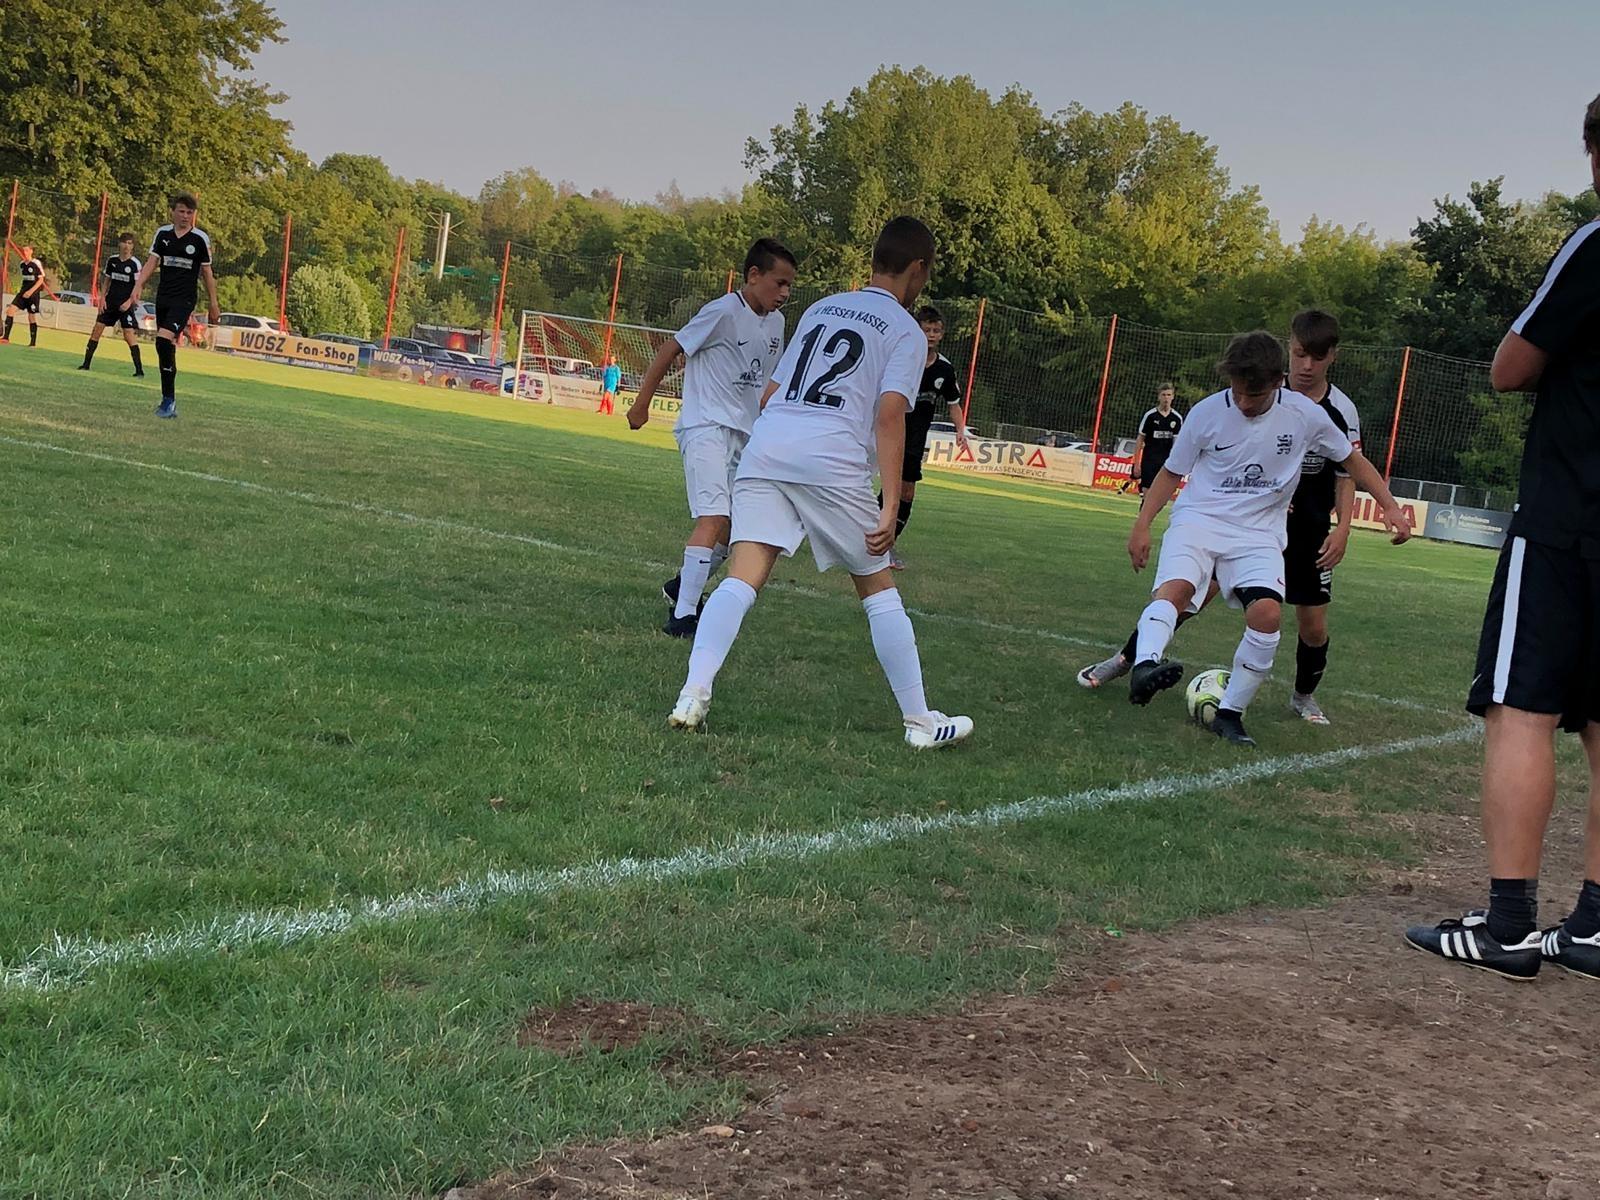 Hallescher FC - U15